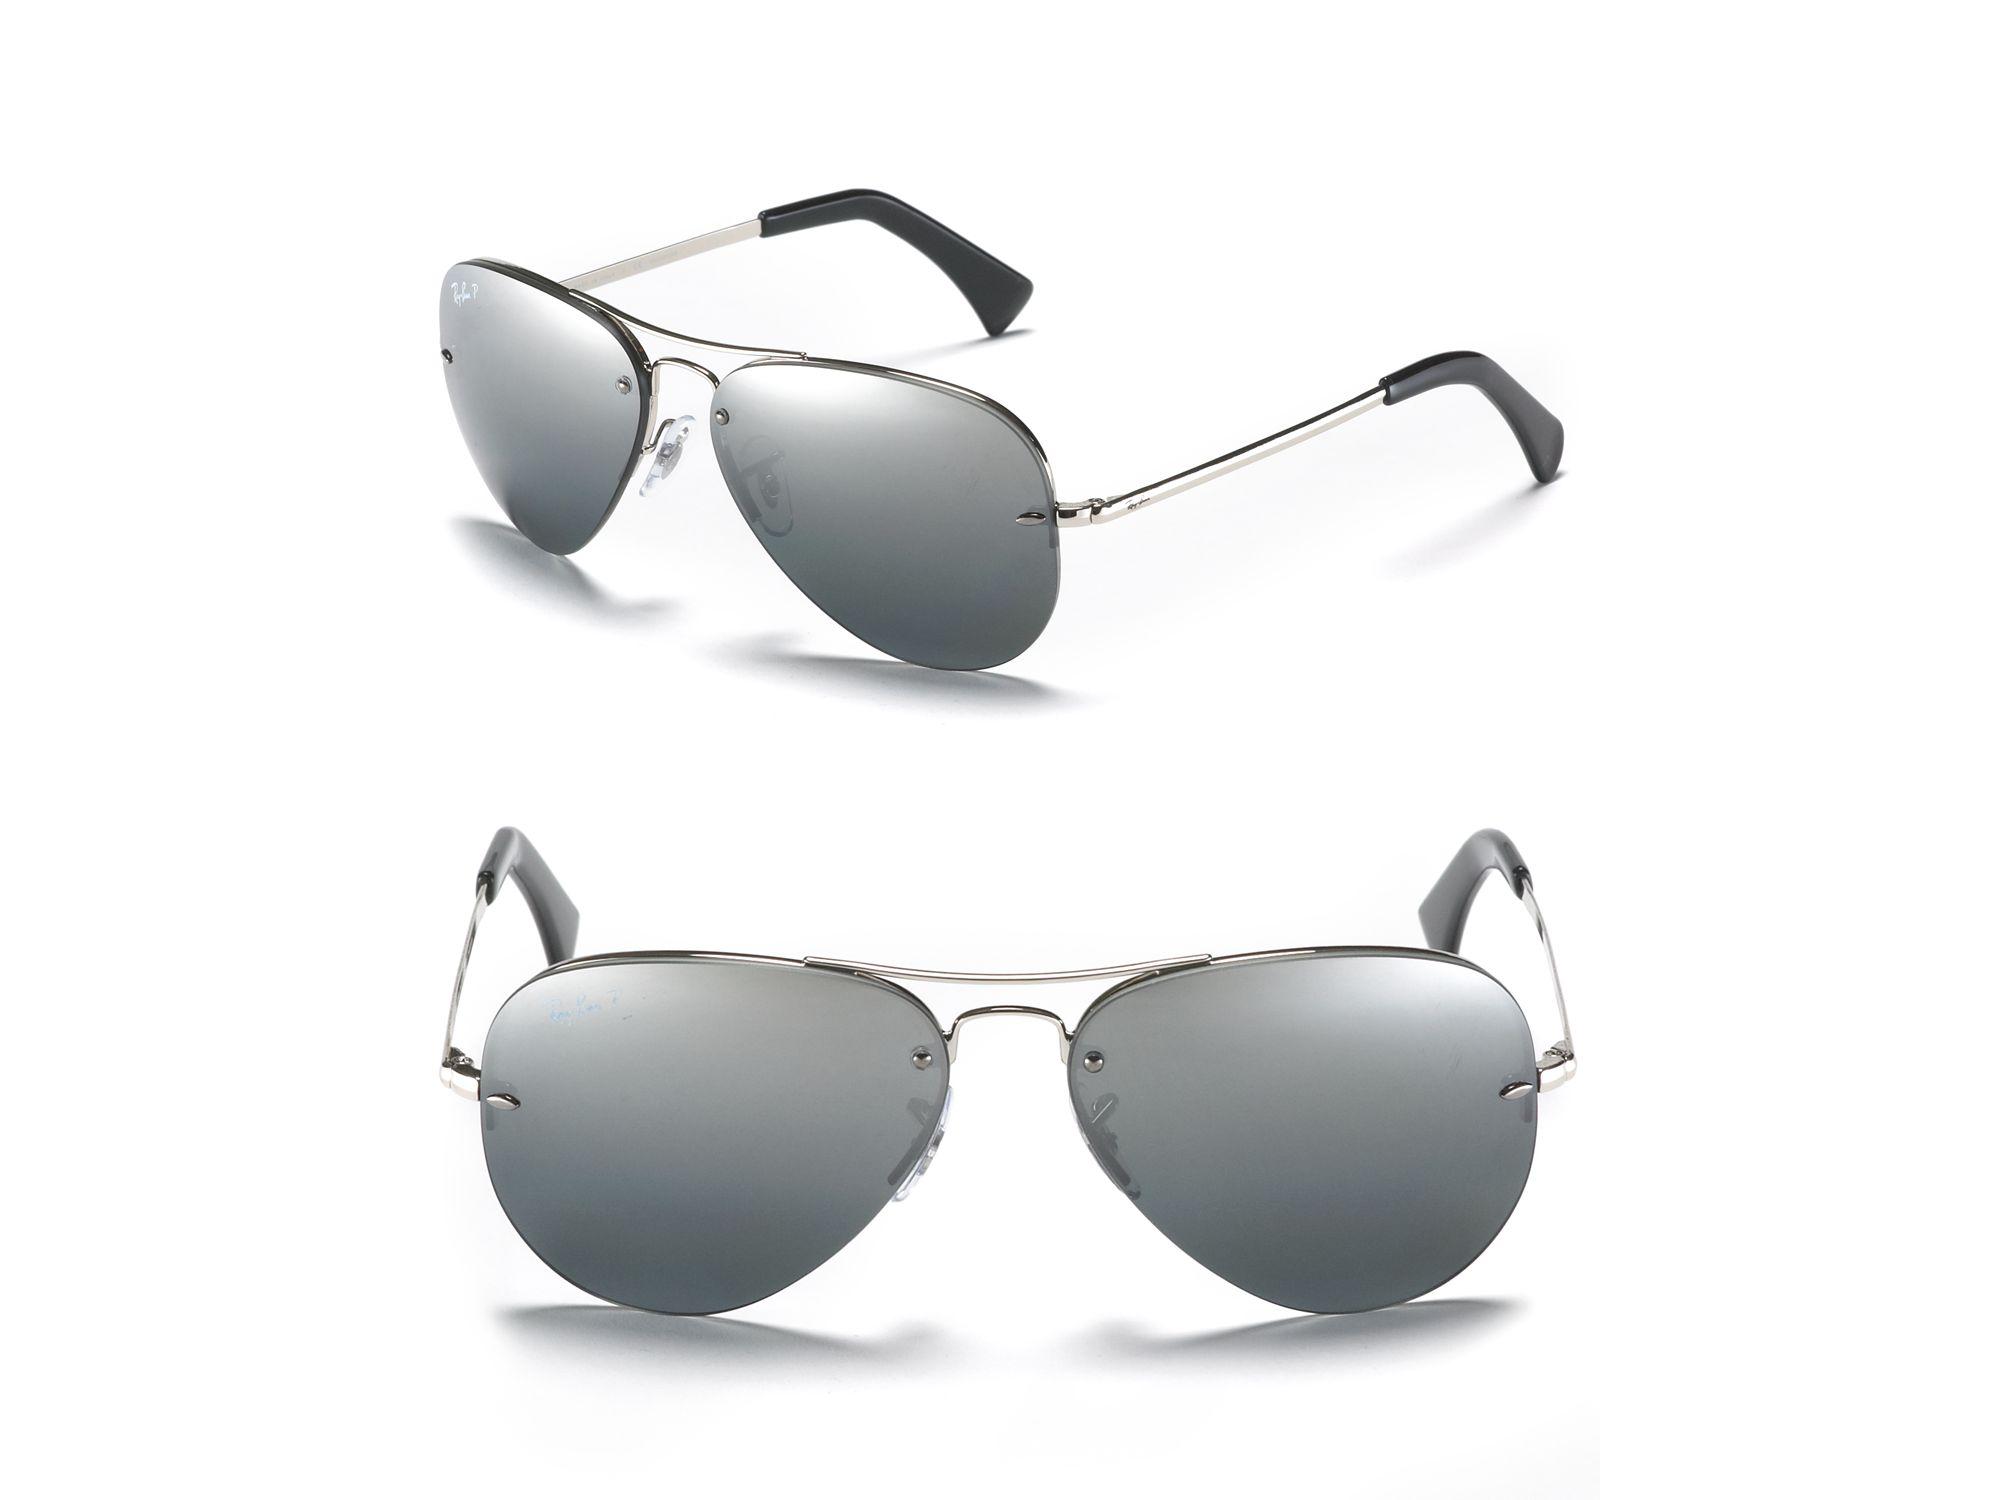 Rimless Polarized Sunglasses : Ray-ban Polarized Rimless Large Aviator Sunglasses in ...